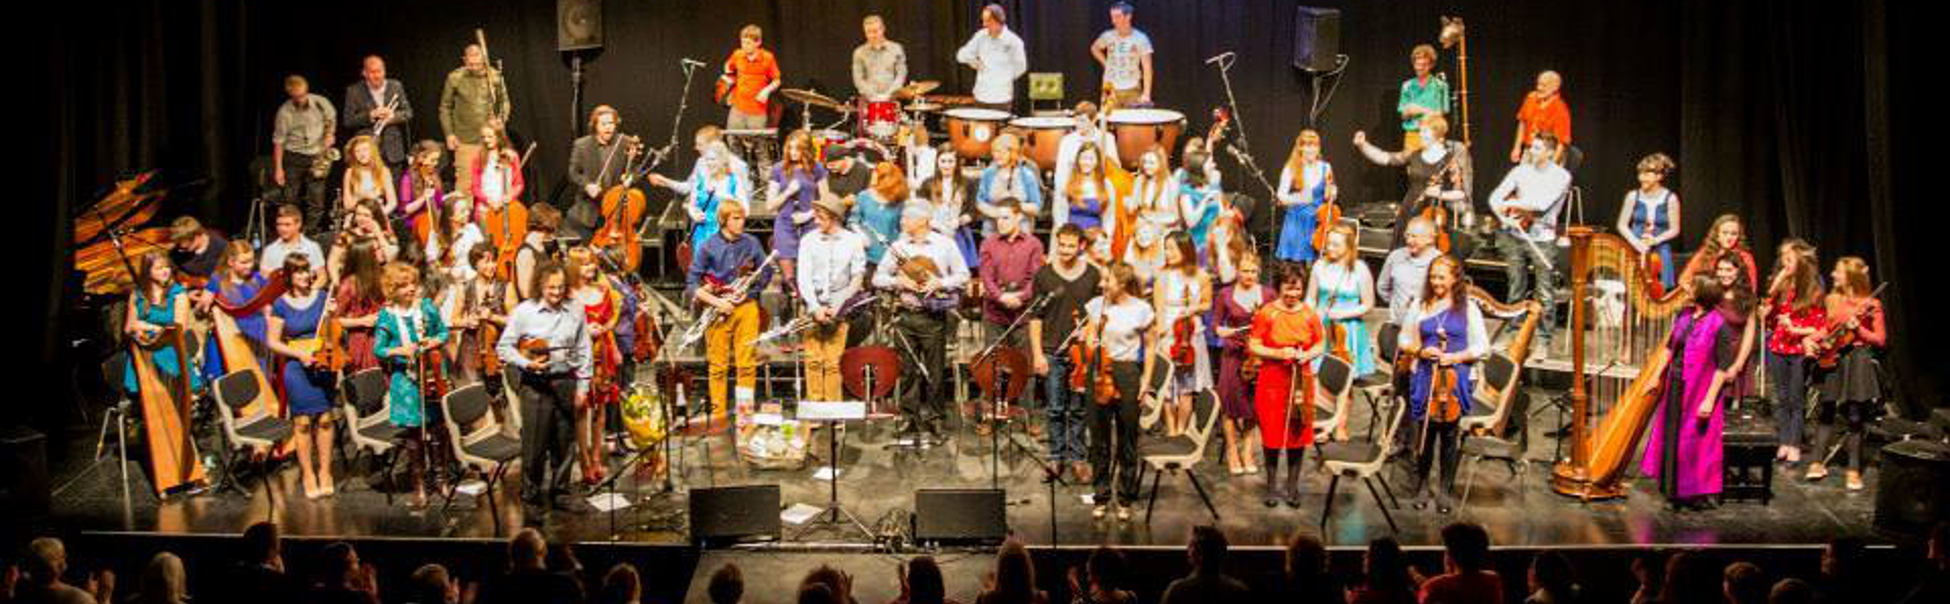 Dave Flynn's Irish Memory Orchestra